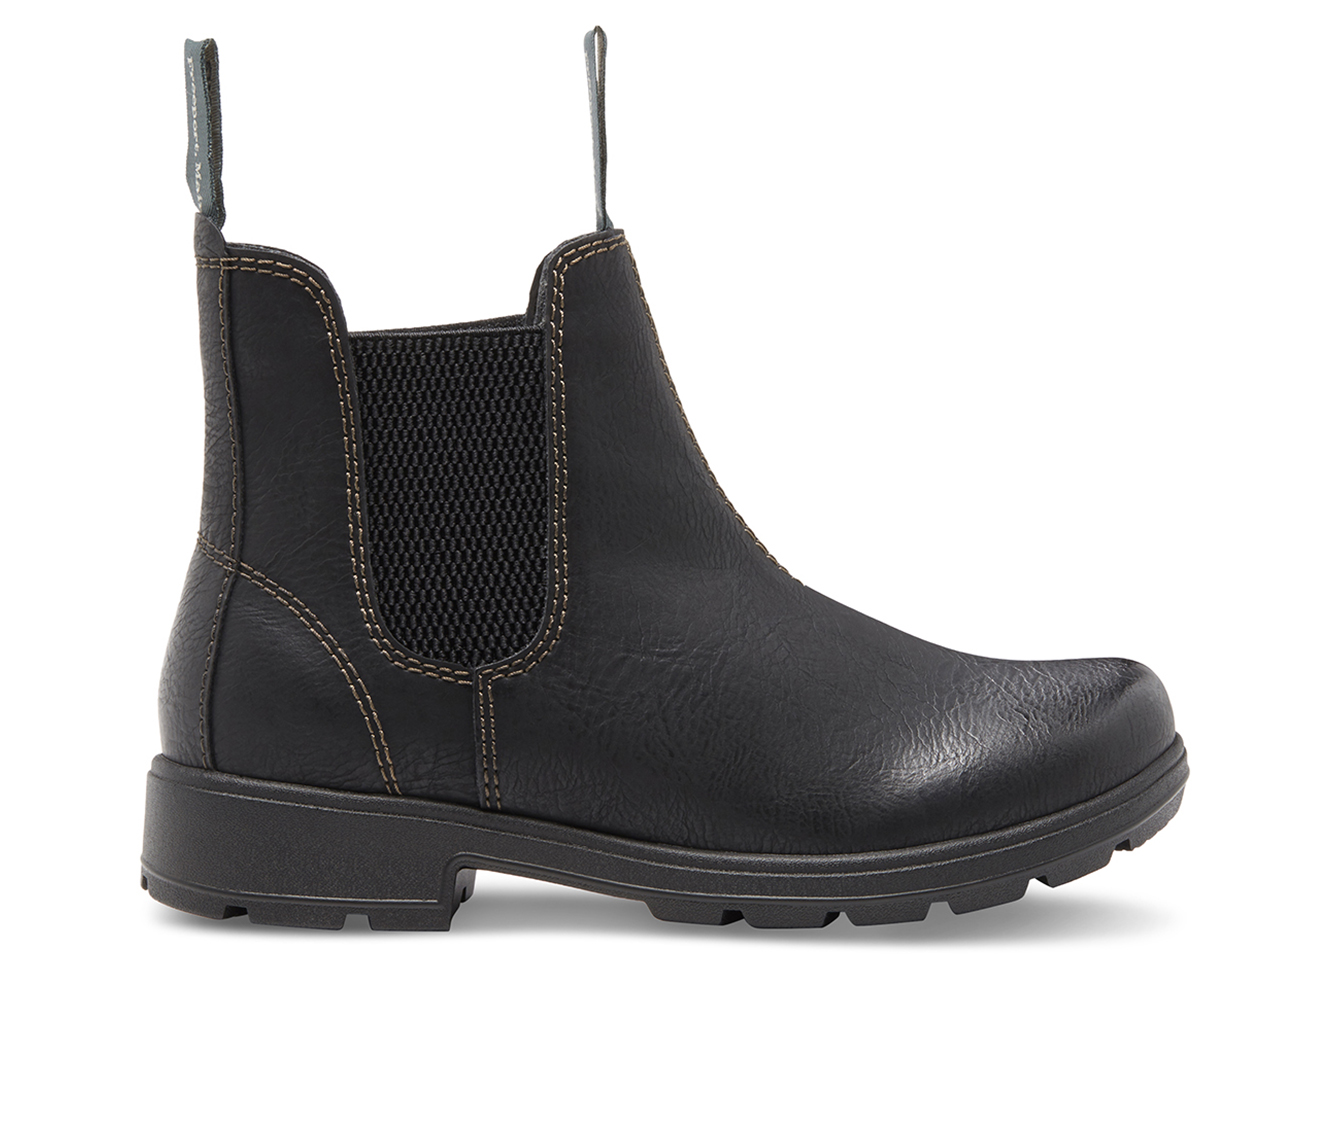 Eastland Baja Women's Boots (Black - Leather)